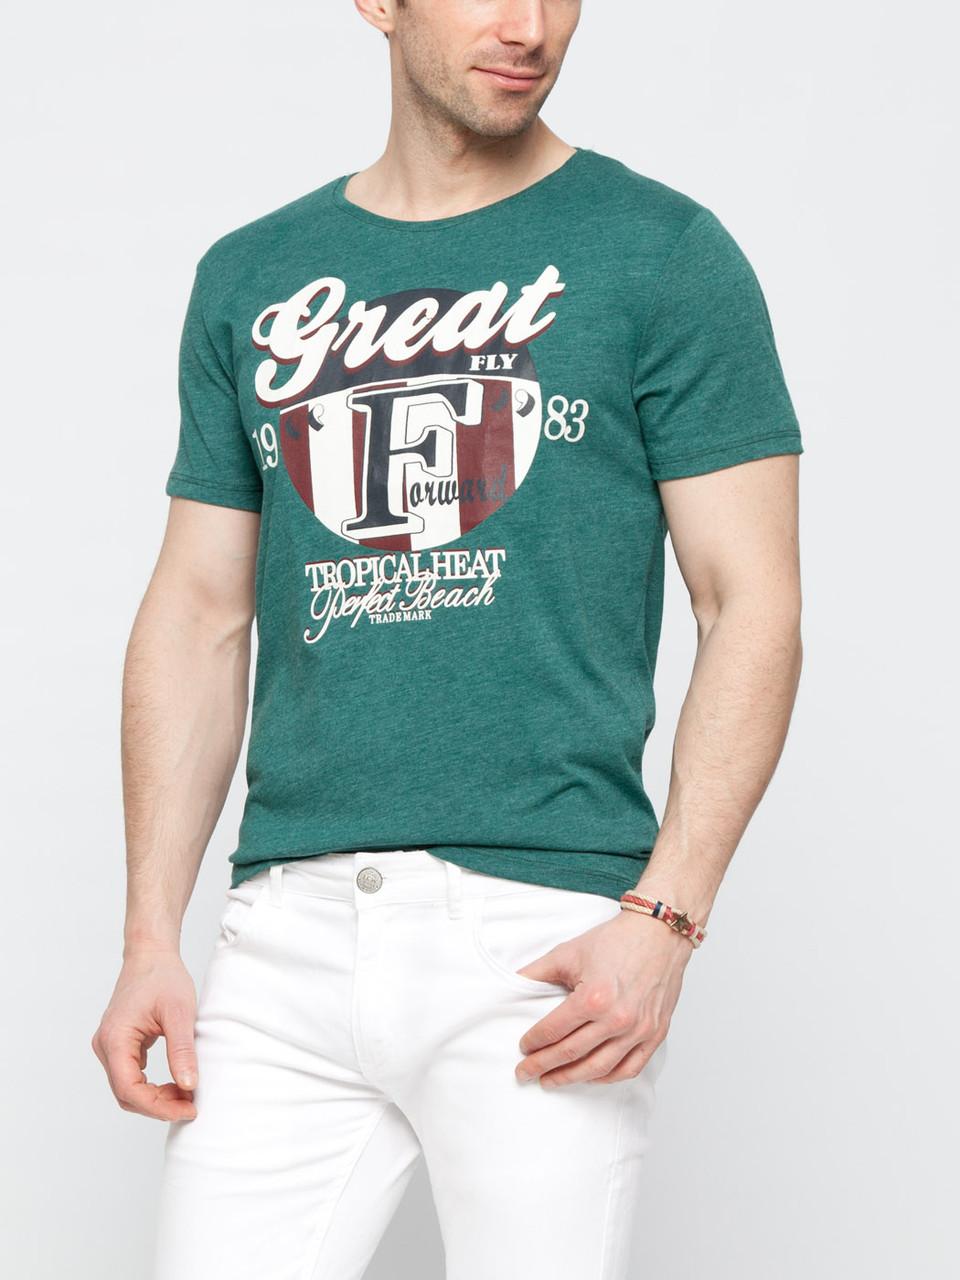 Мужская футболка зеленая LC Waikiki с рисунком на груди